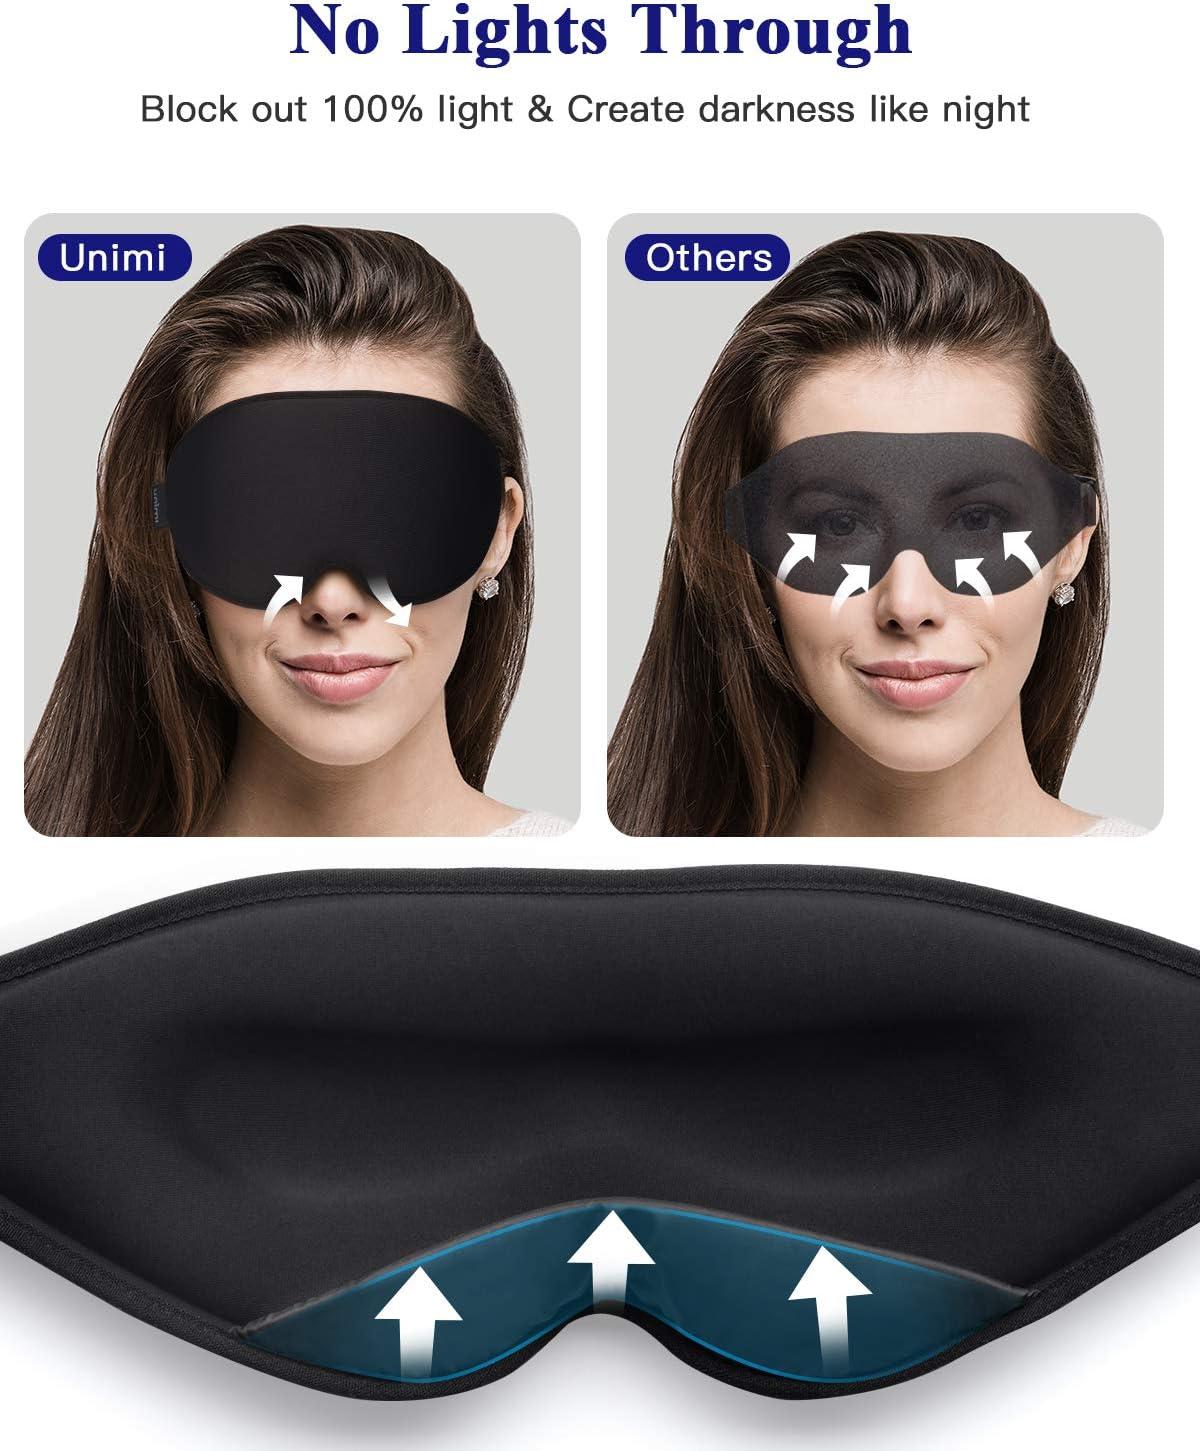 Unimi Newest Sleep Eye Mask for Men Women,Comfortable Silk Eye Sleeping Mask & Blindfold,The Real Deep Contoured Cup Sleep Mask Eye Mask for Sleeping,100% Shading Eye Shade Cover for Travel,Nap,Yoga: Health & Personal Care